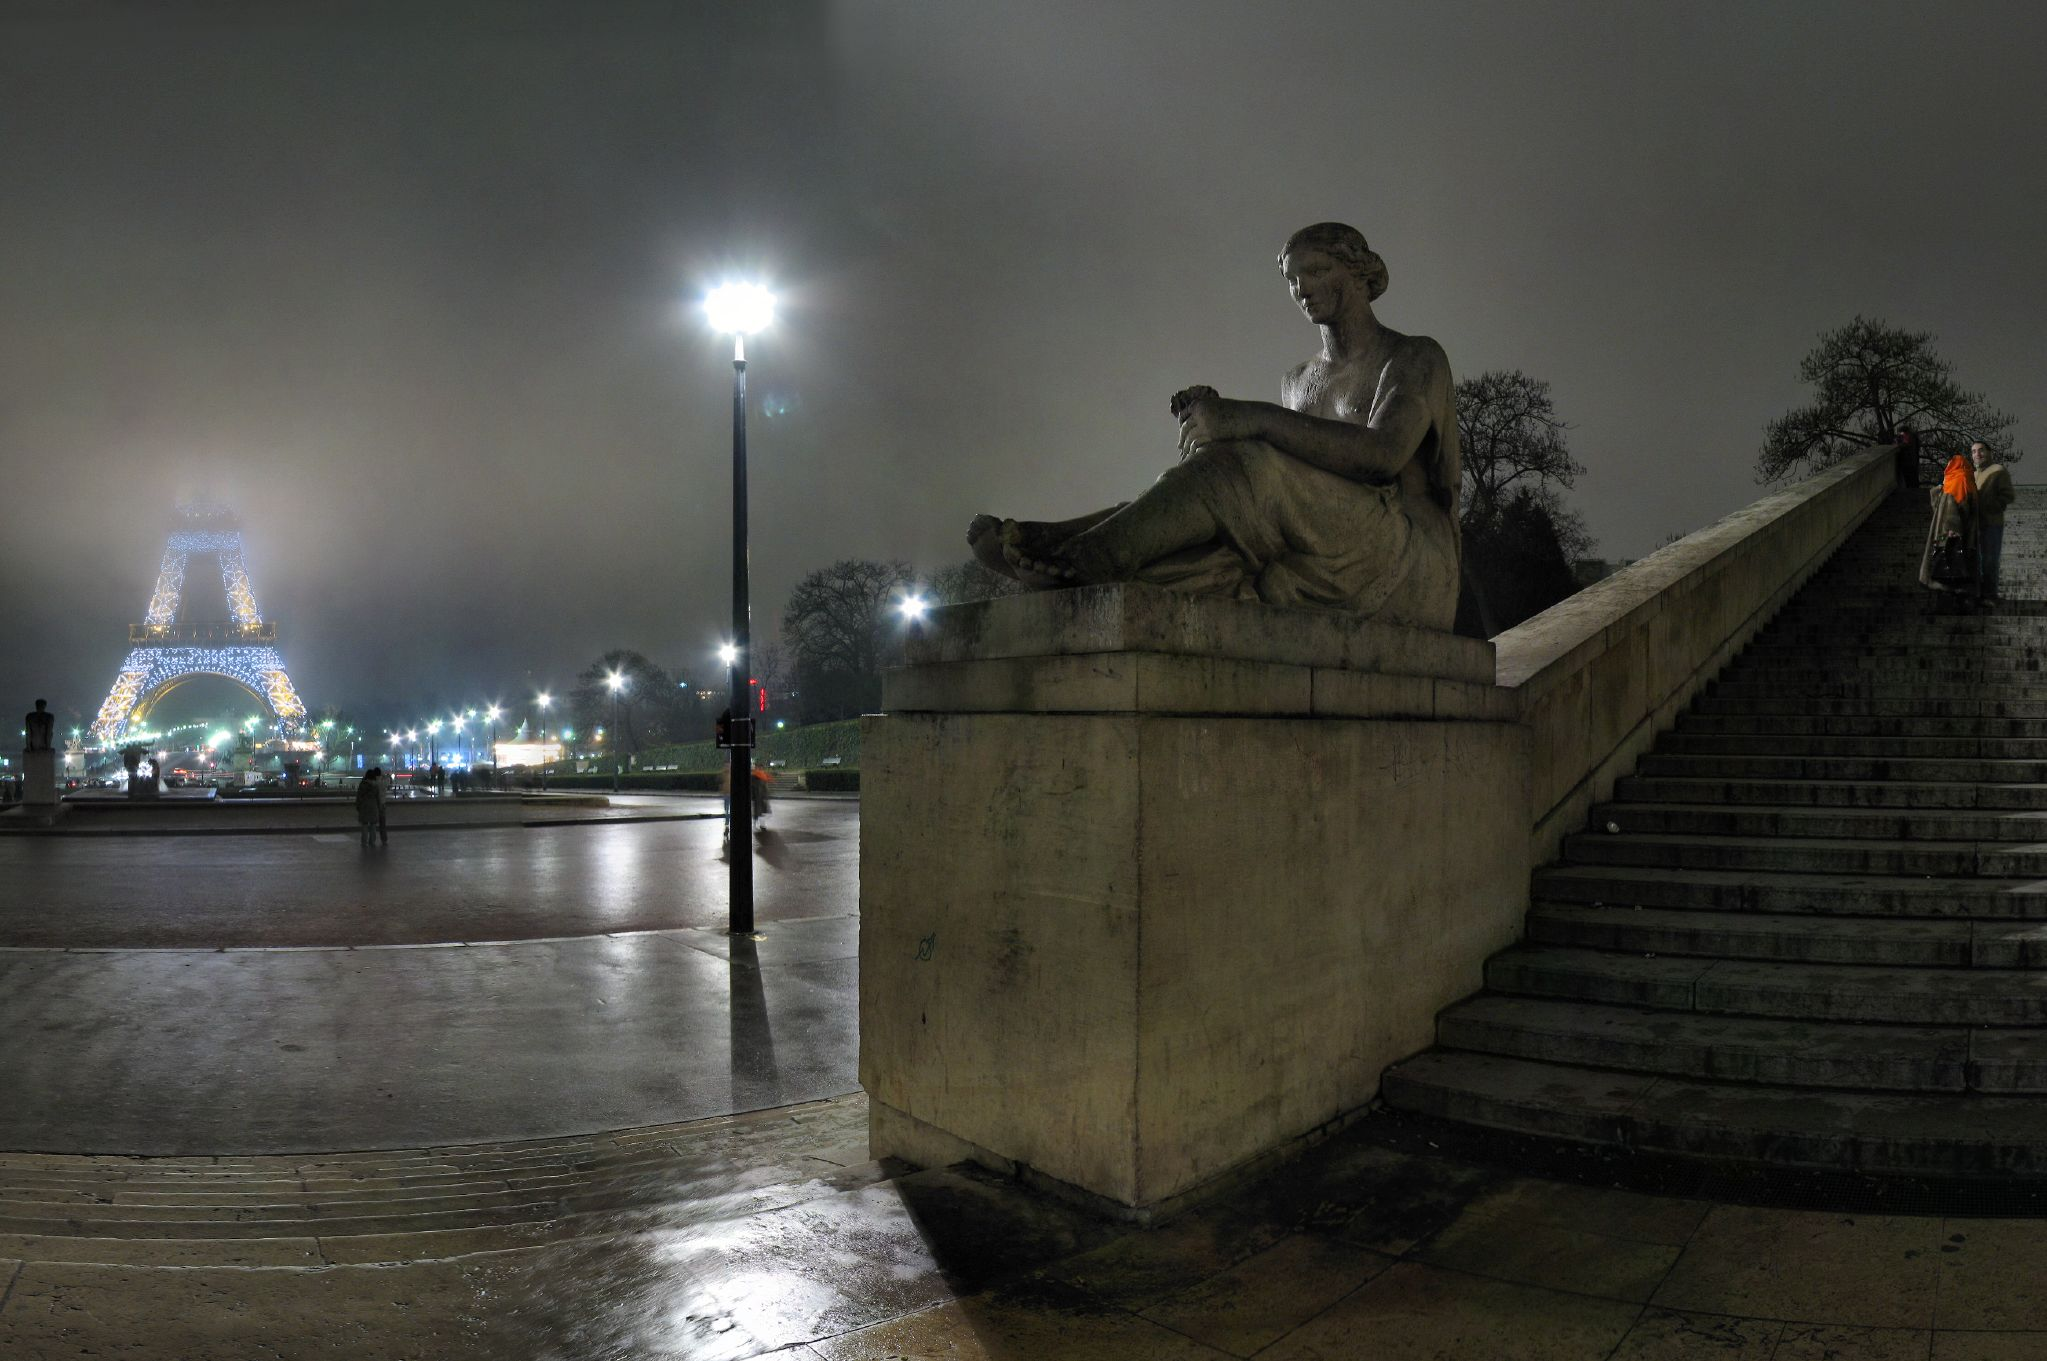 Paris - Trocadéro - 24-12-2007 - 21h59